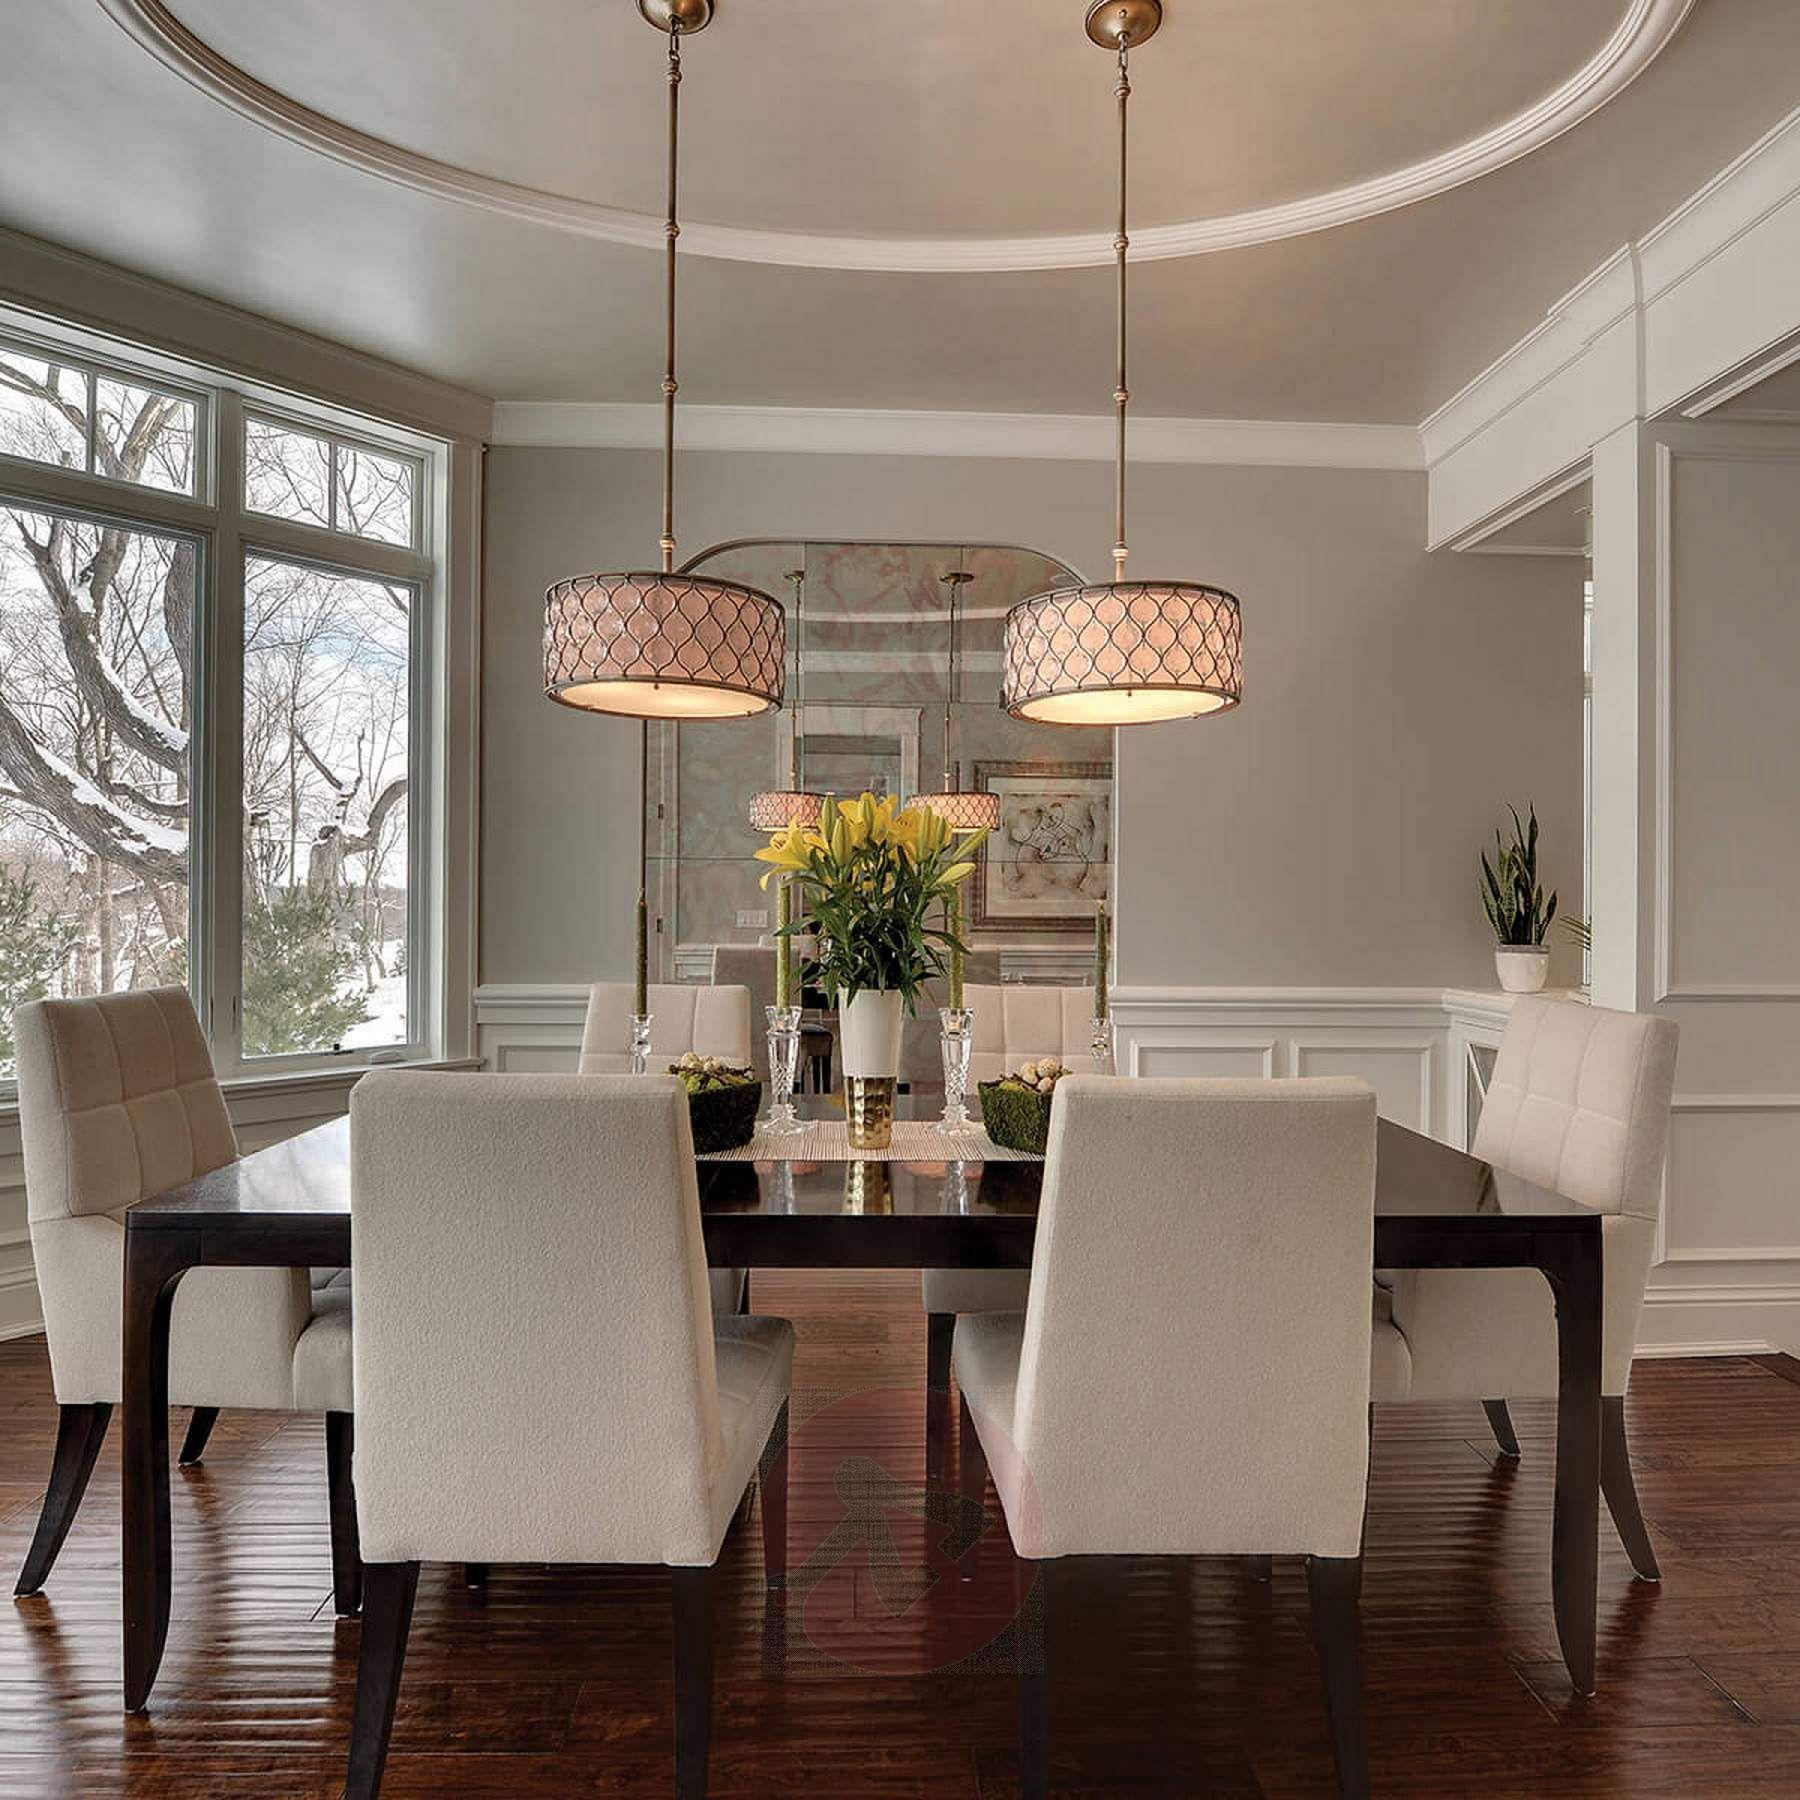 20 Extraordinary And Cool Dining Room Lighting Ideas Dining Room Lighting Room Lights Modern Dining Room Lighting